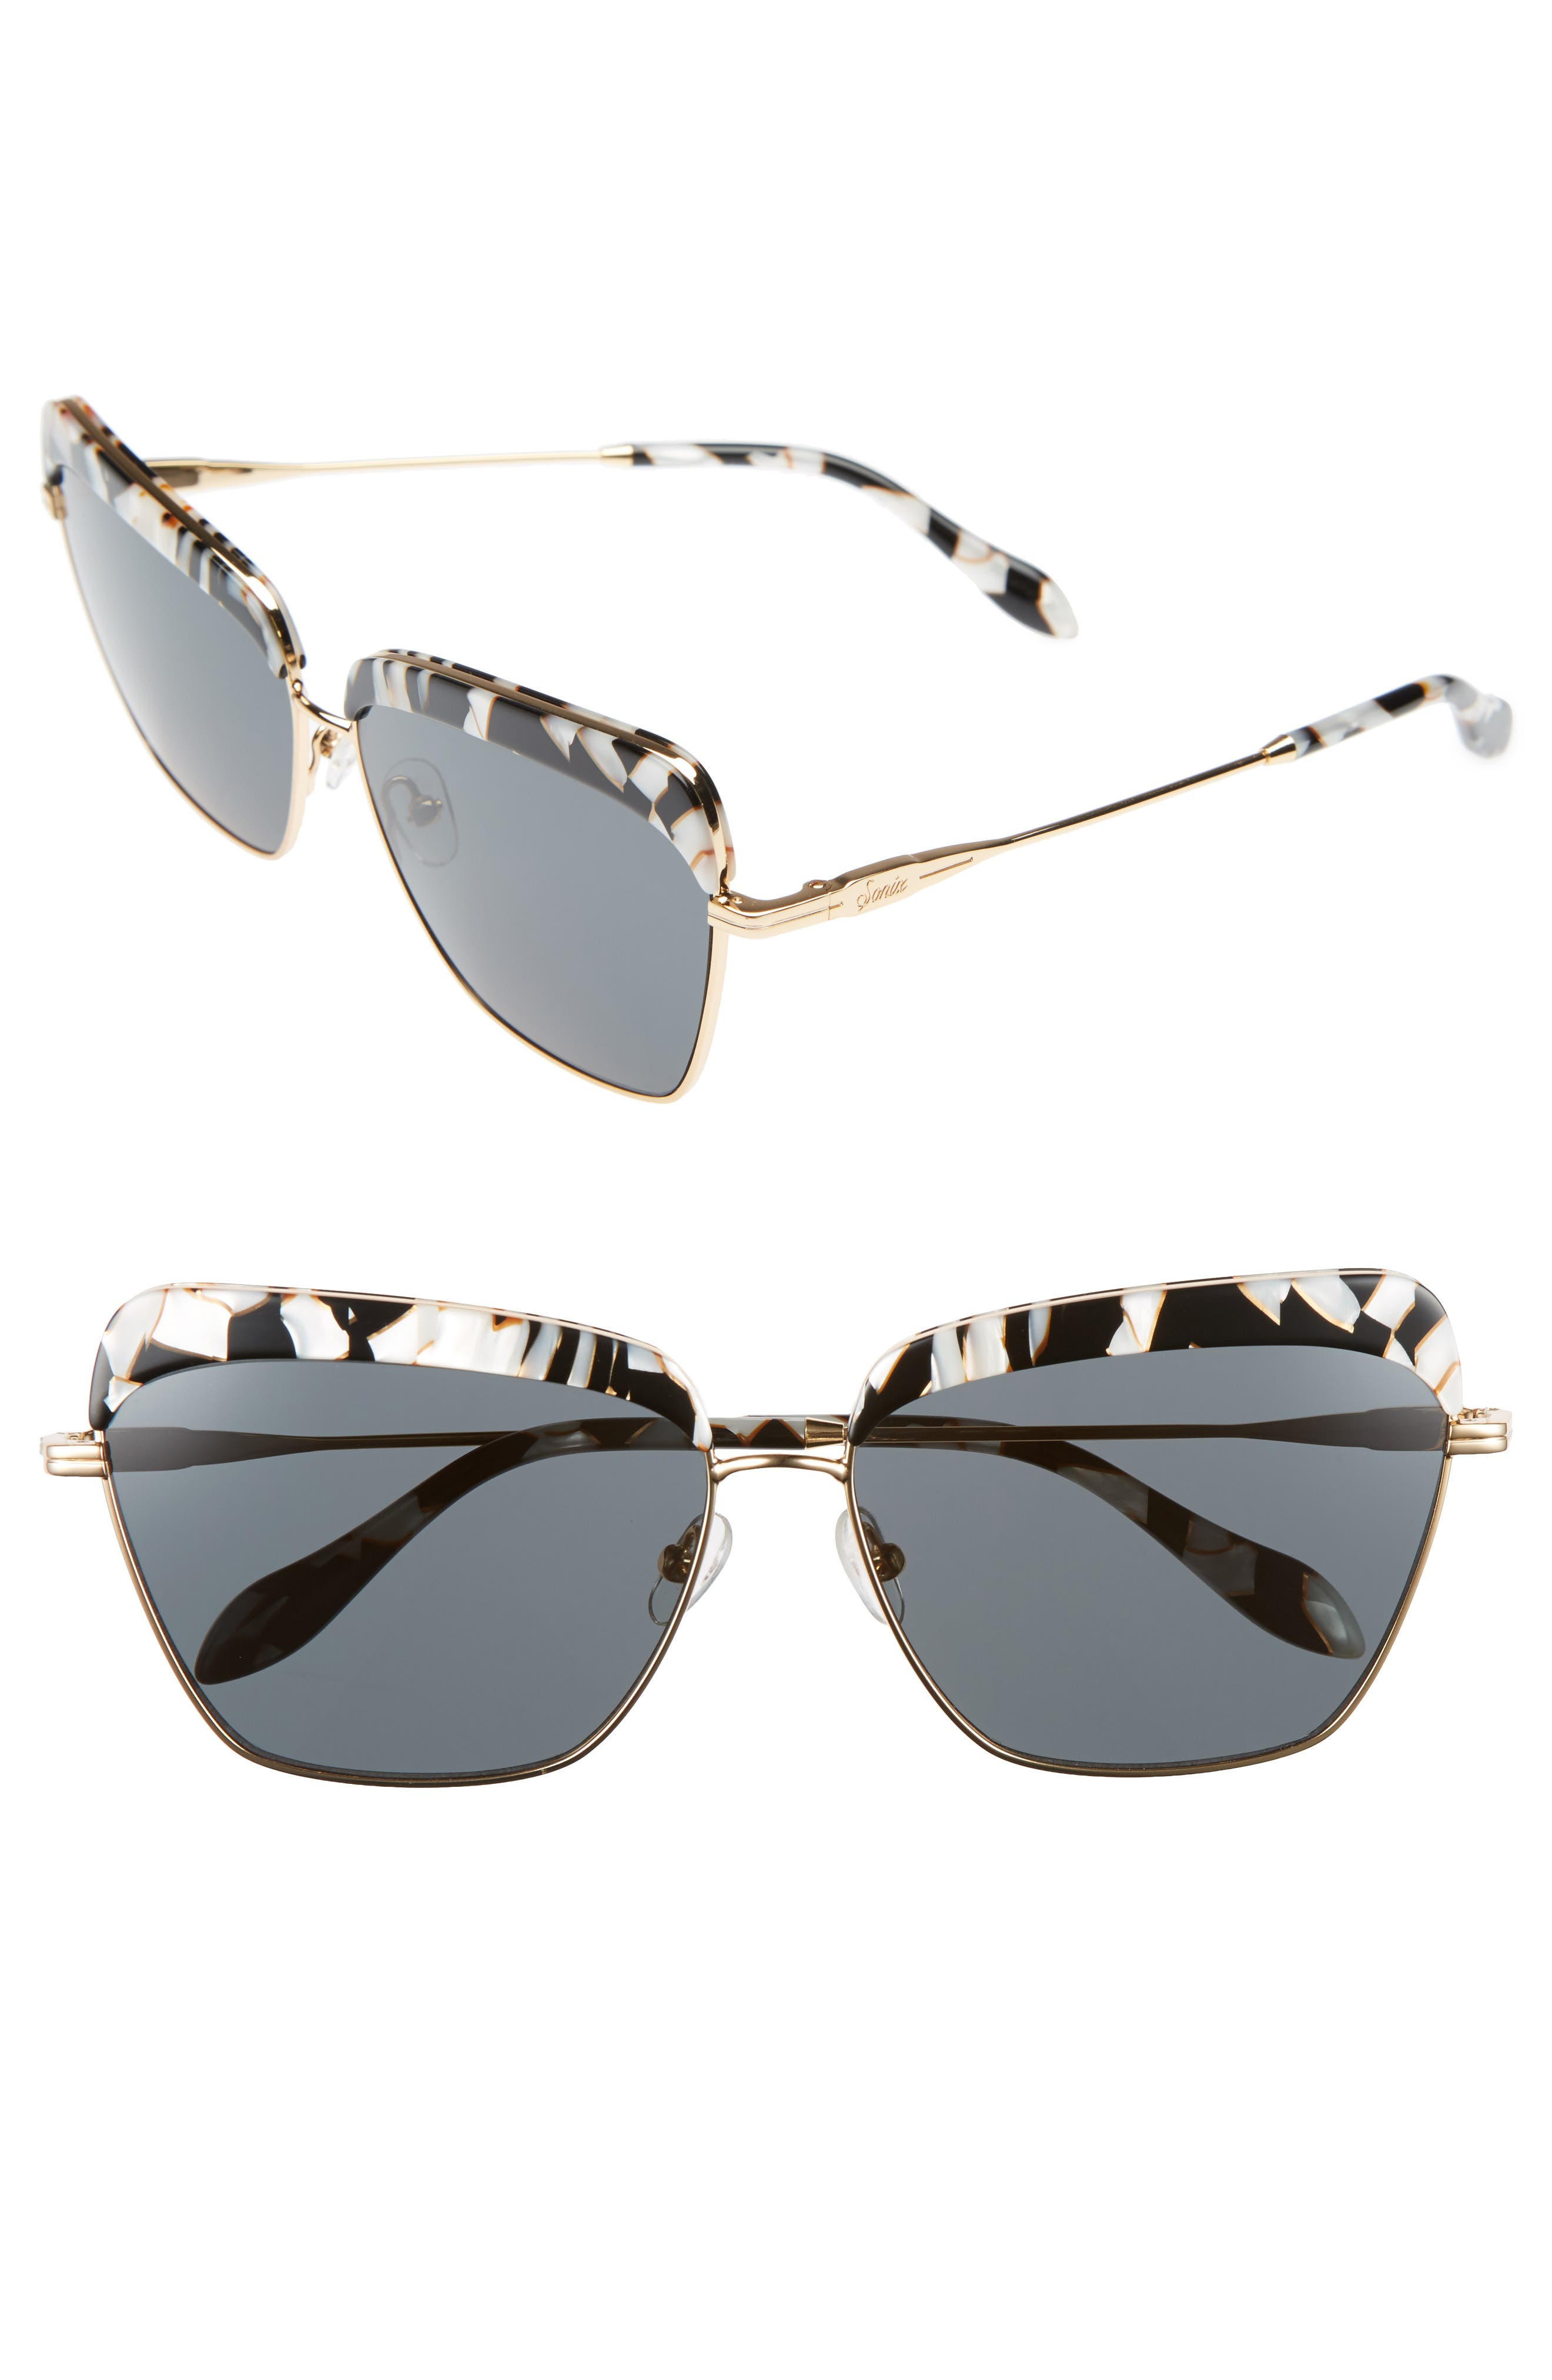 SONIX Highland 61mm Square Sunglasses